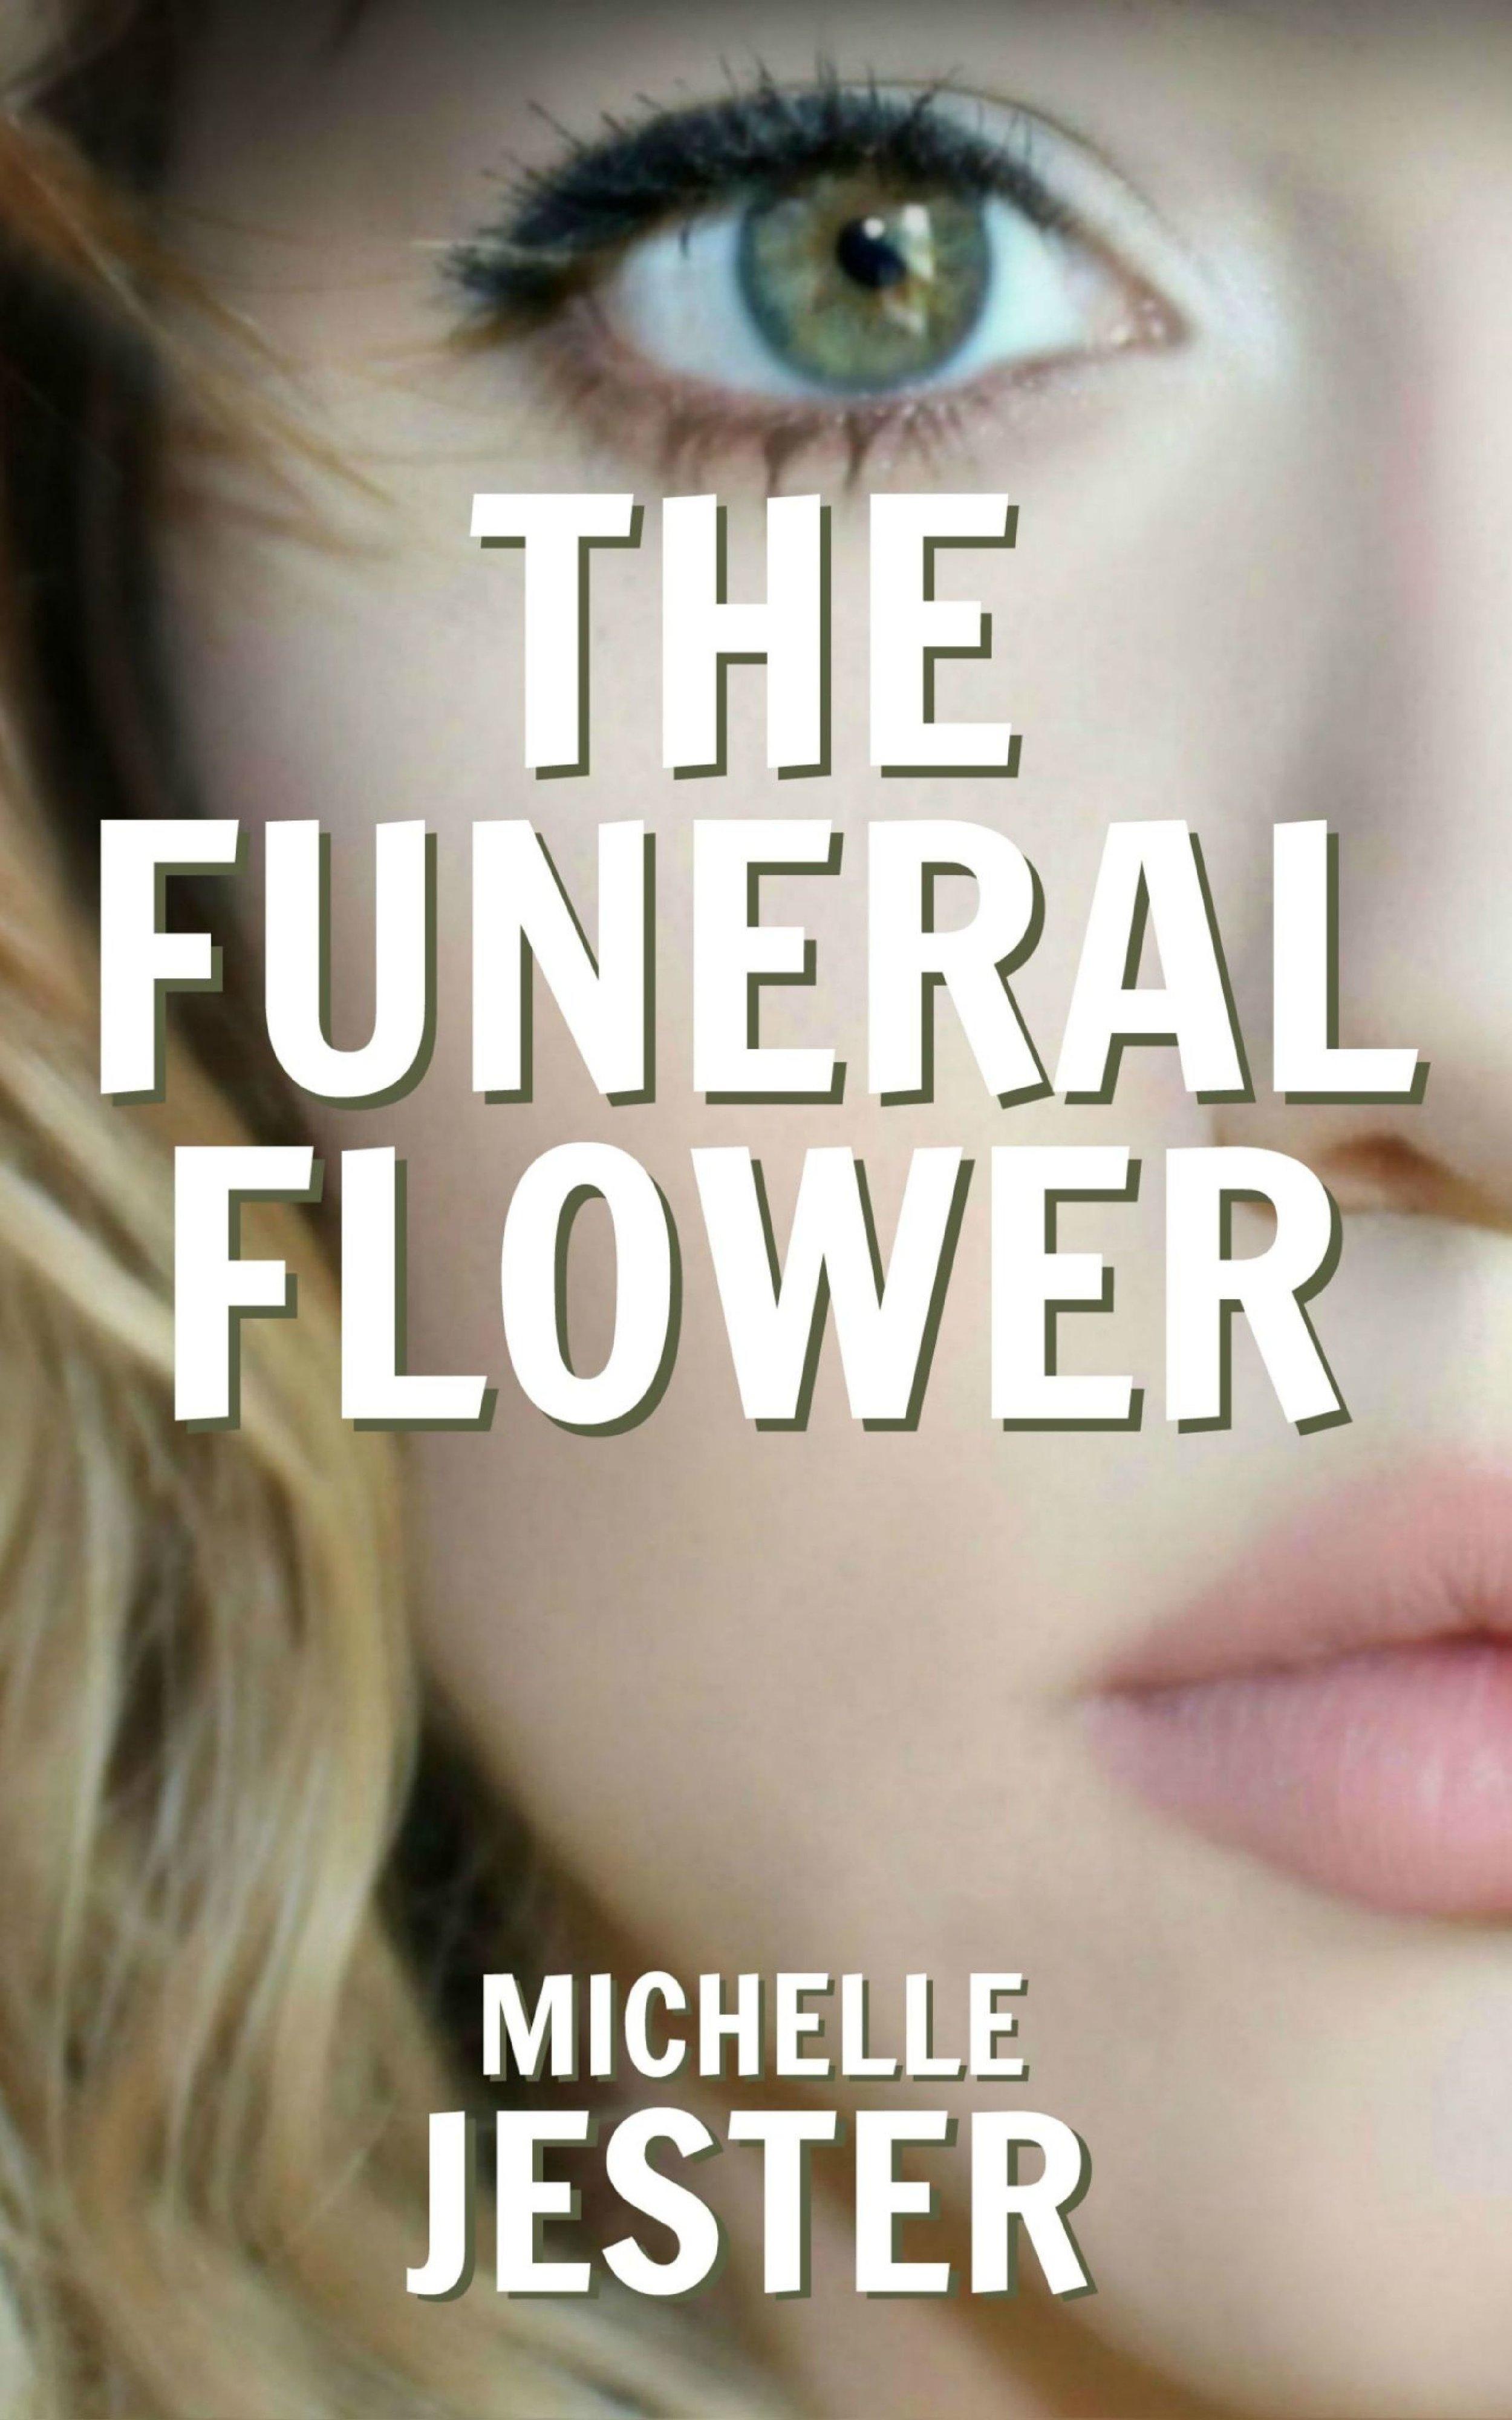 The_Funeral_Flower_Cover.jpg